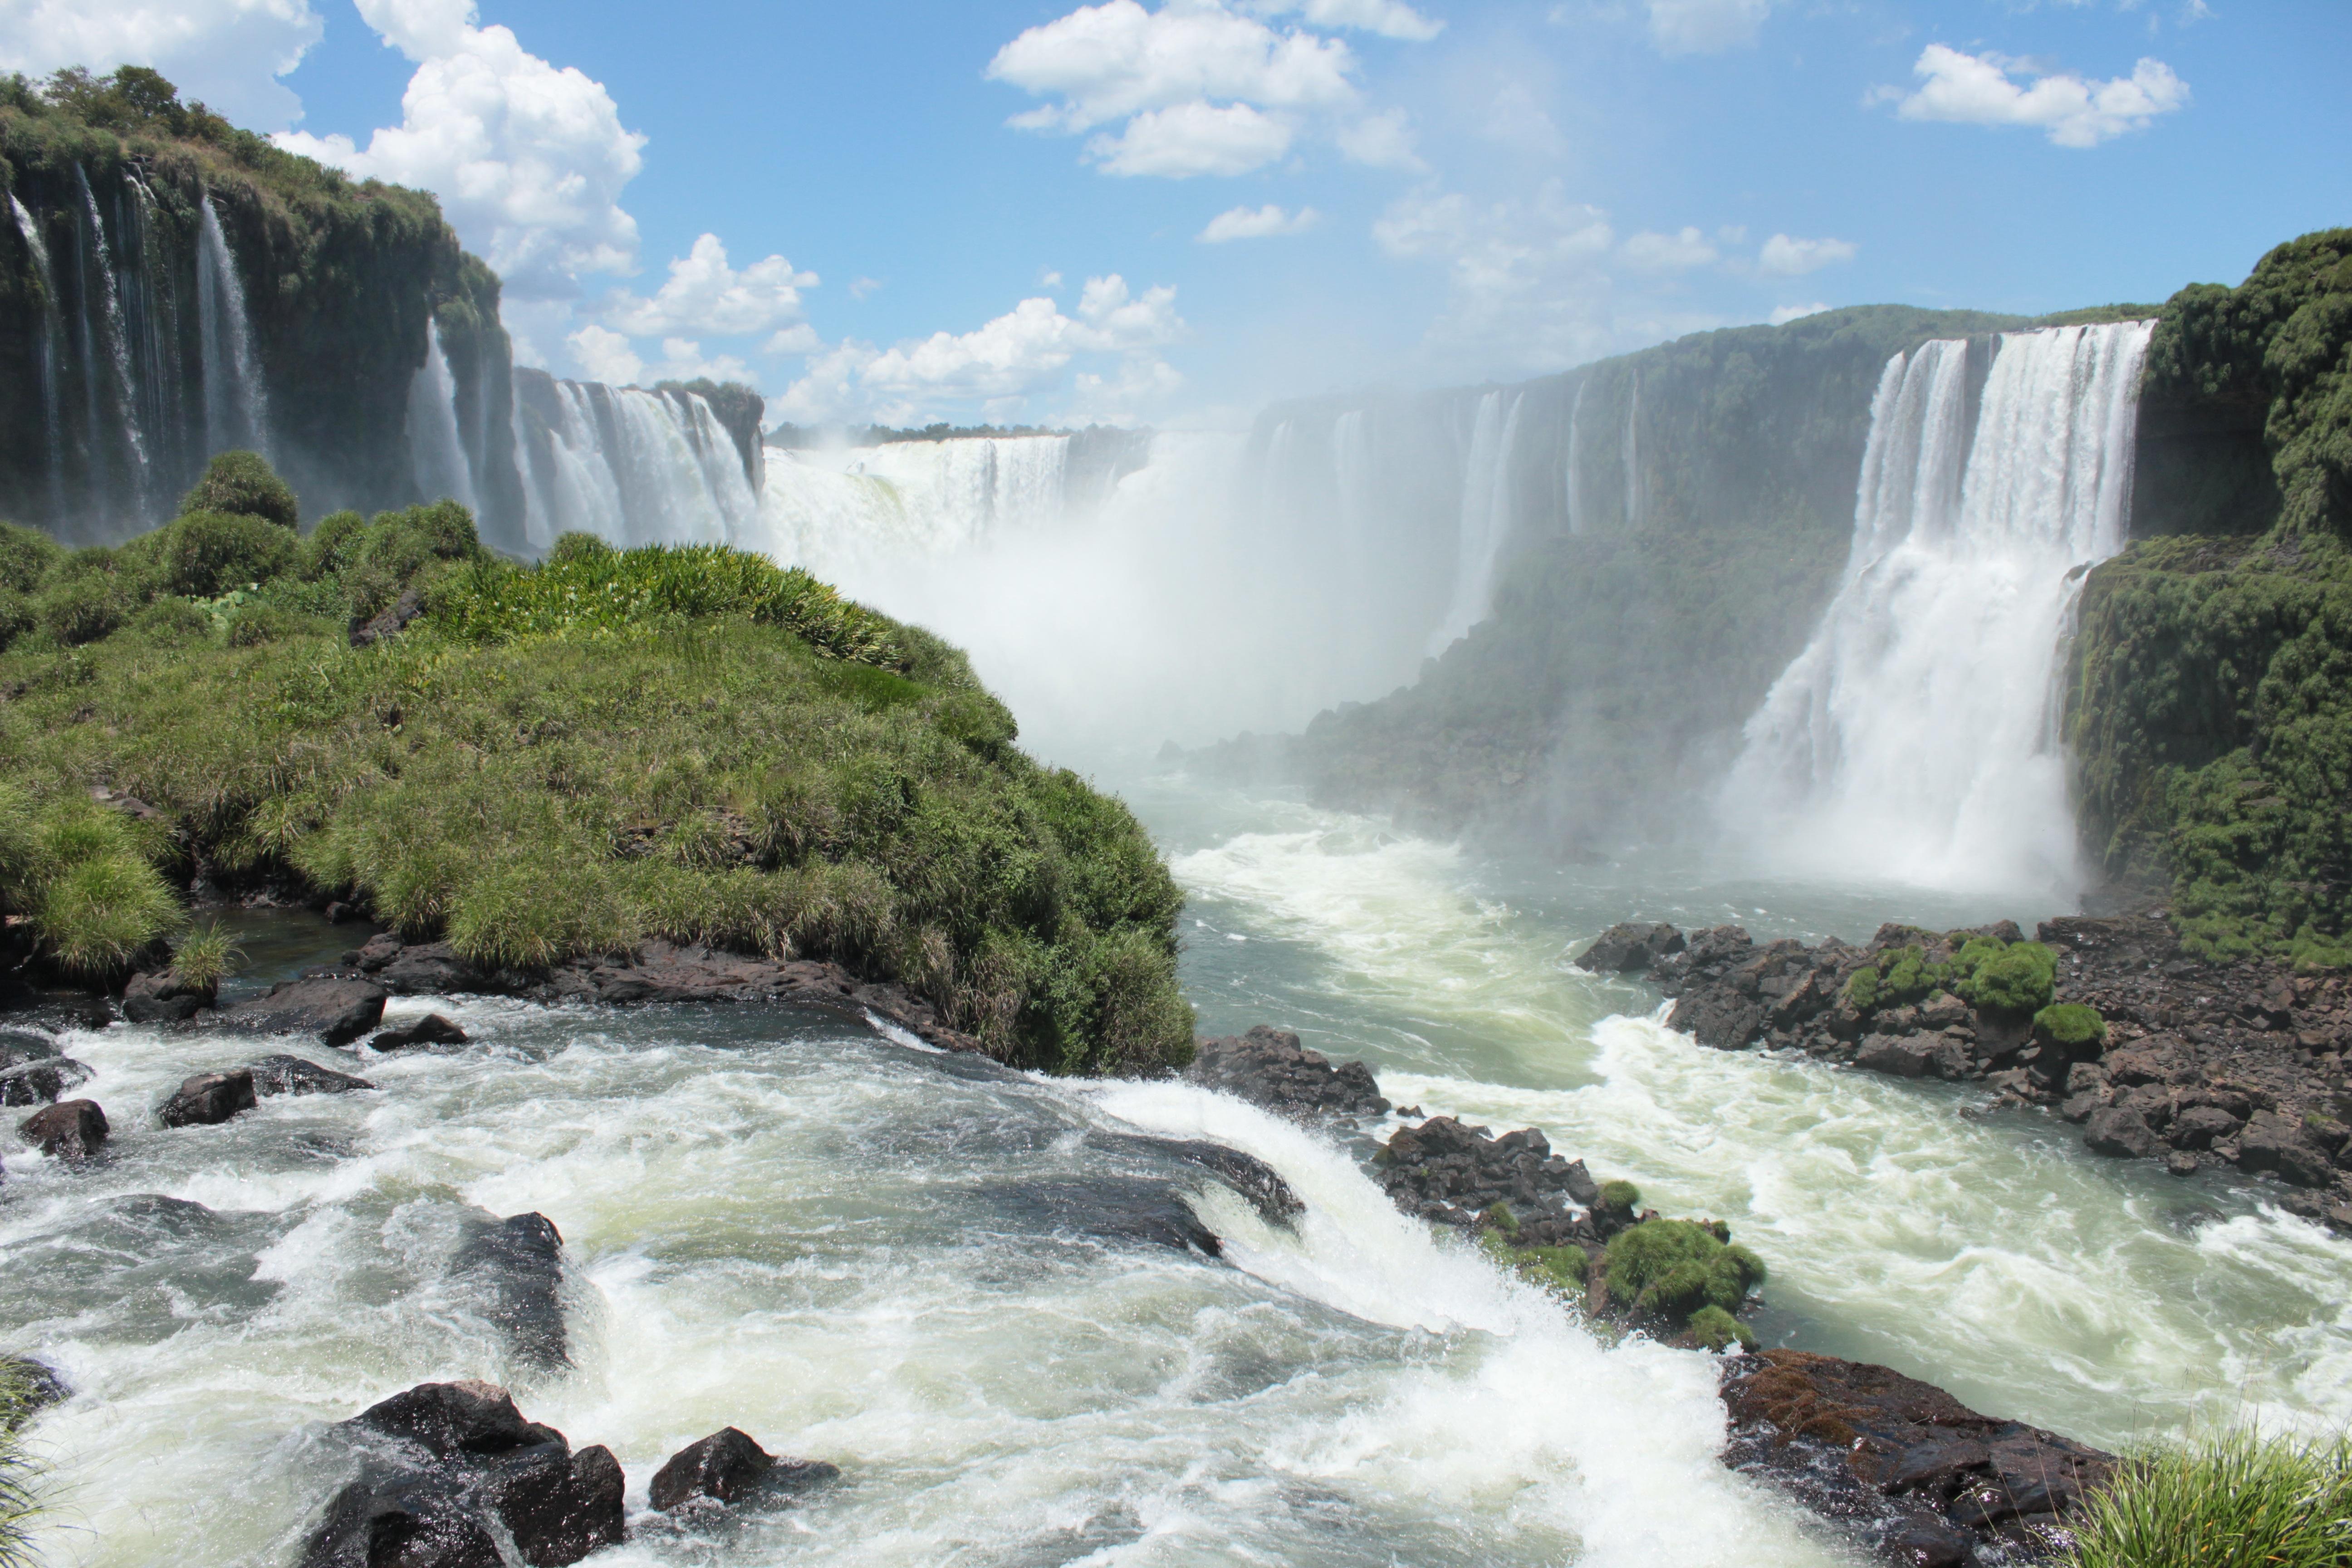 Горы лес водопад картинка